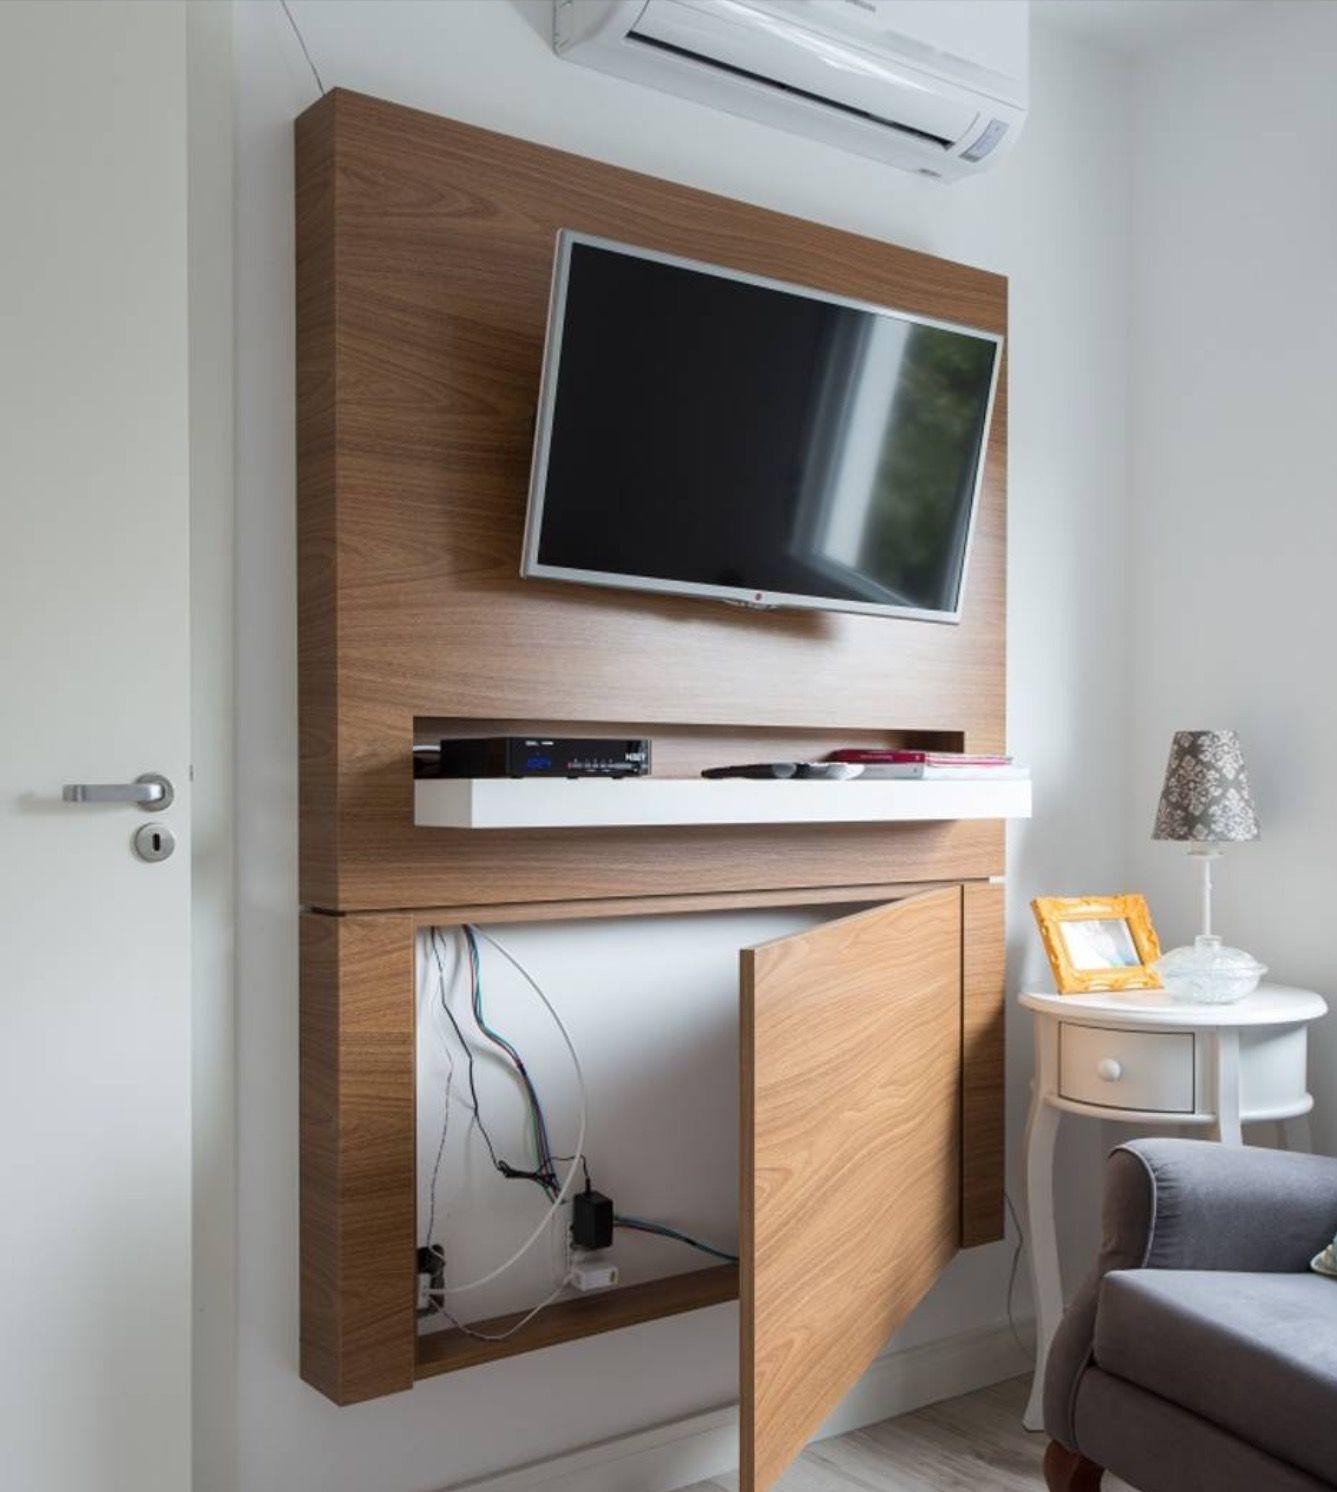 Pin de Adrie en Living room | Pinterest | muebles para TV, Televisor ...